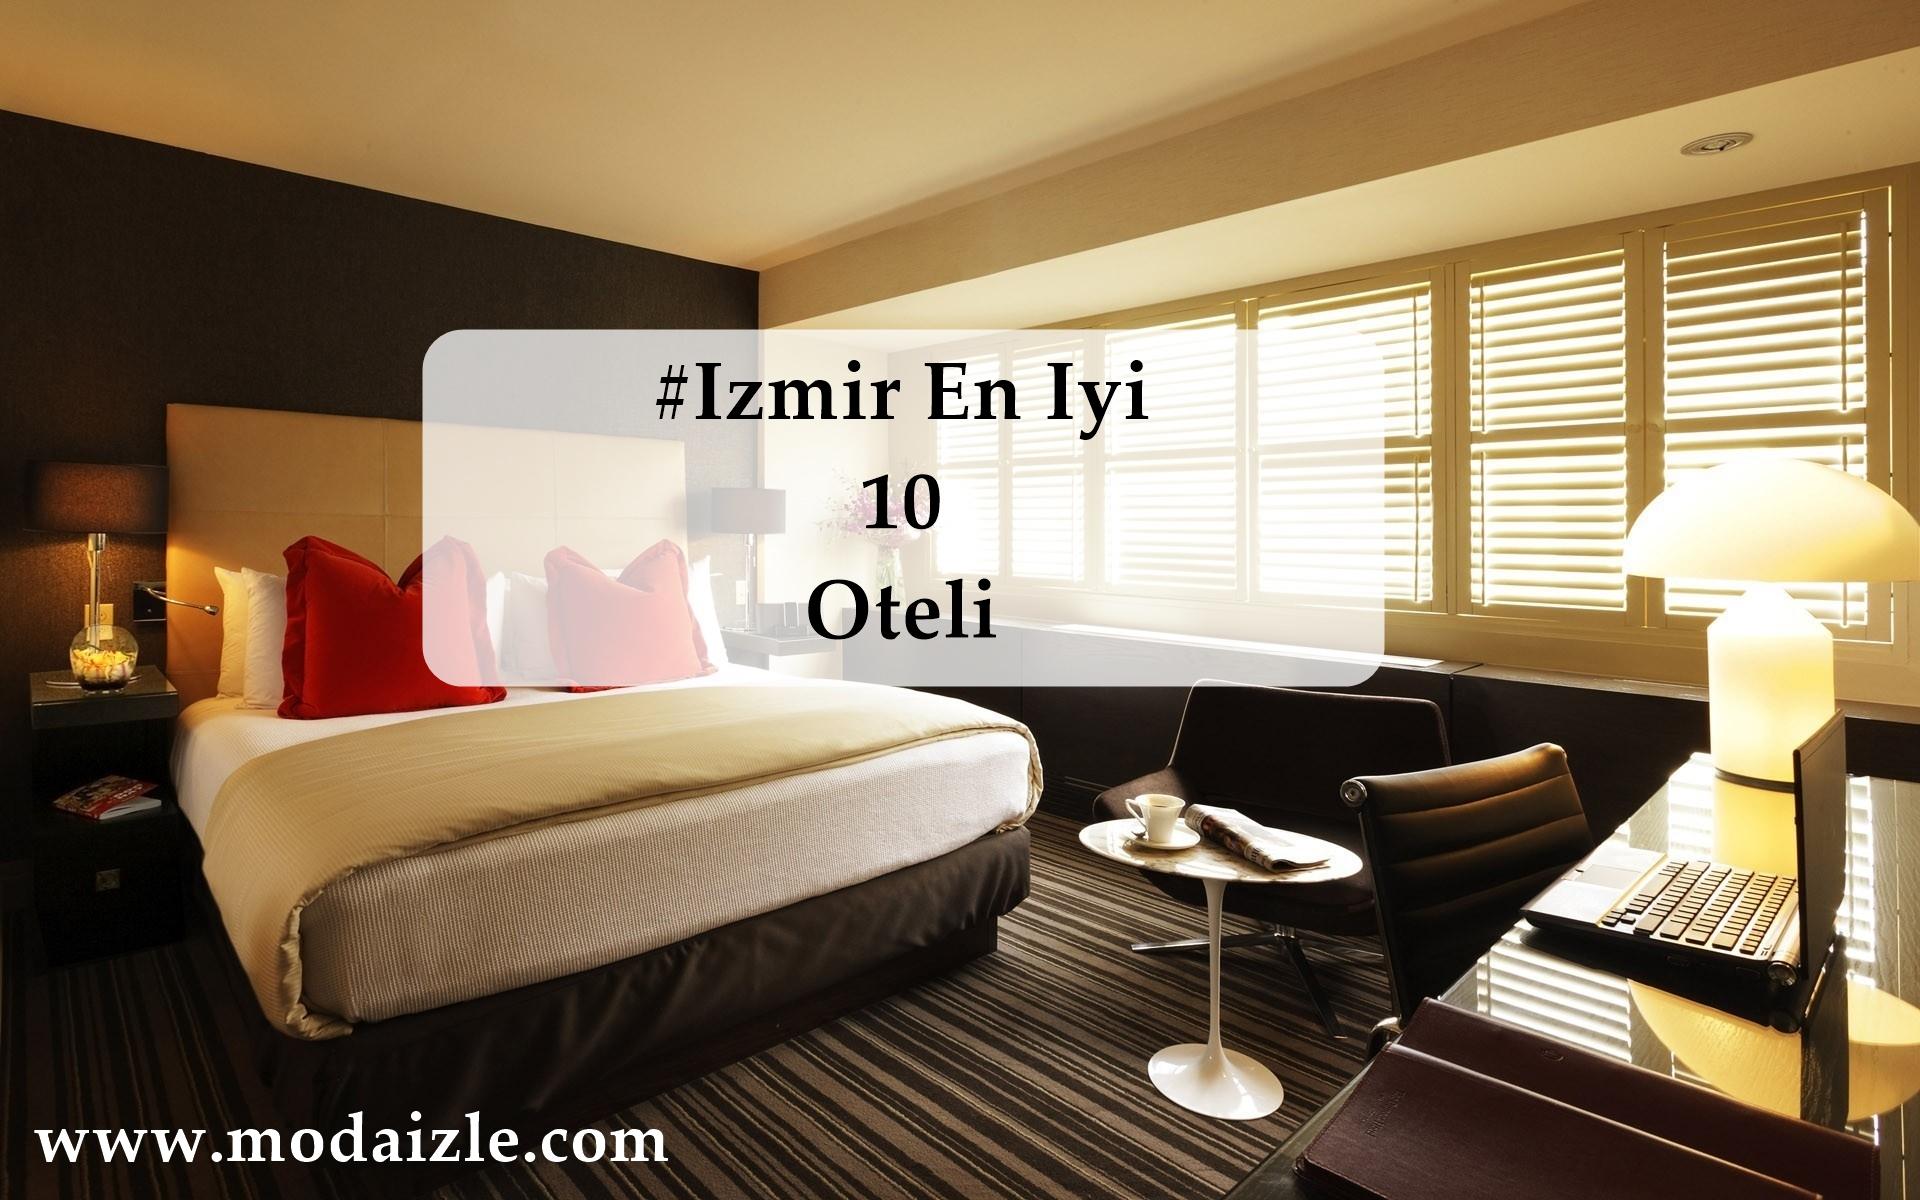 İzmirdeki En Güzel 10 Otel Hangisi